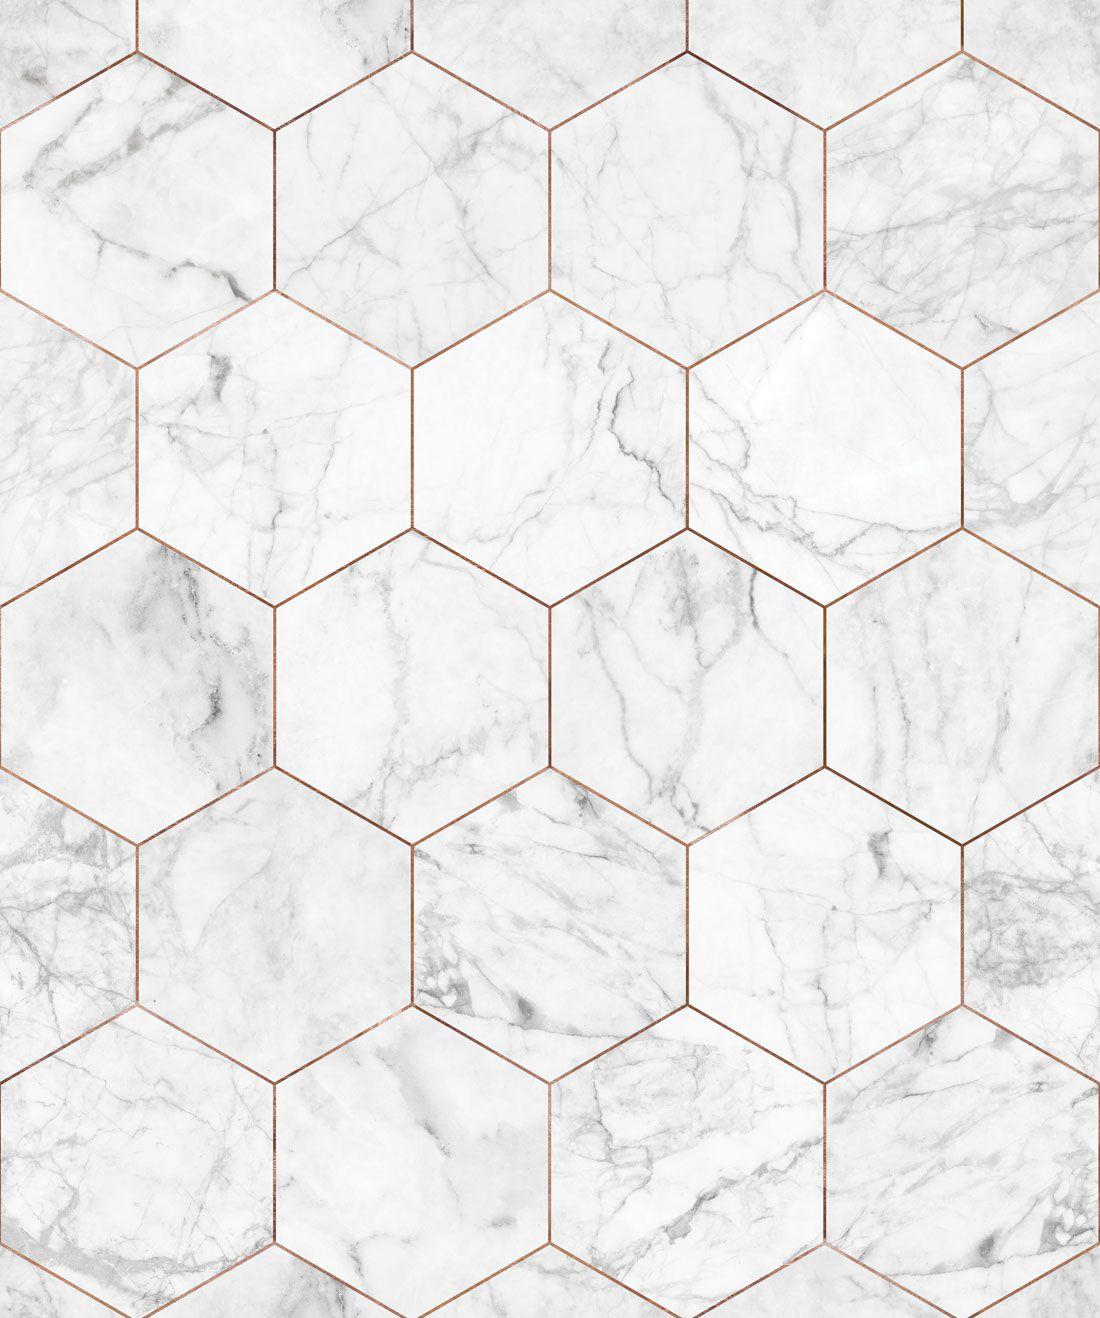 Marble & Copper Tiles Wallpaper